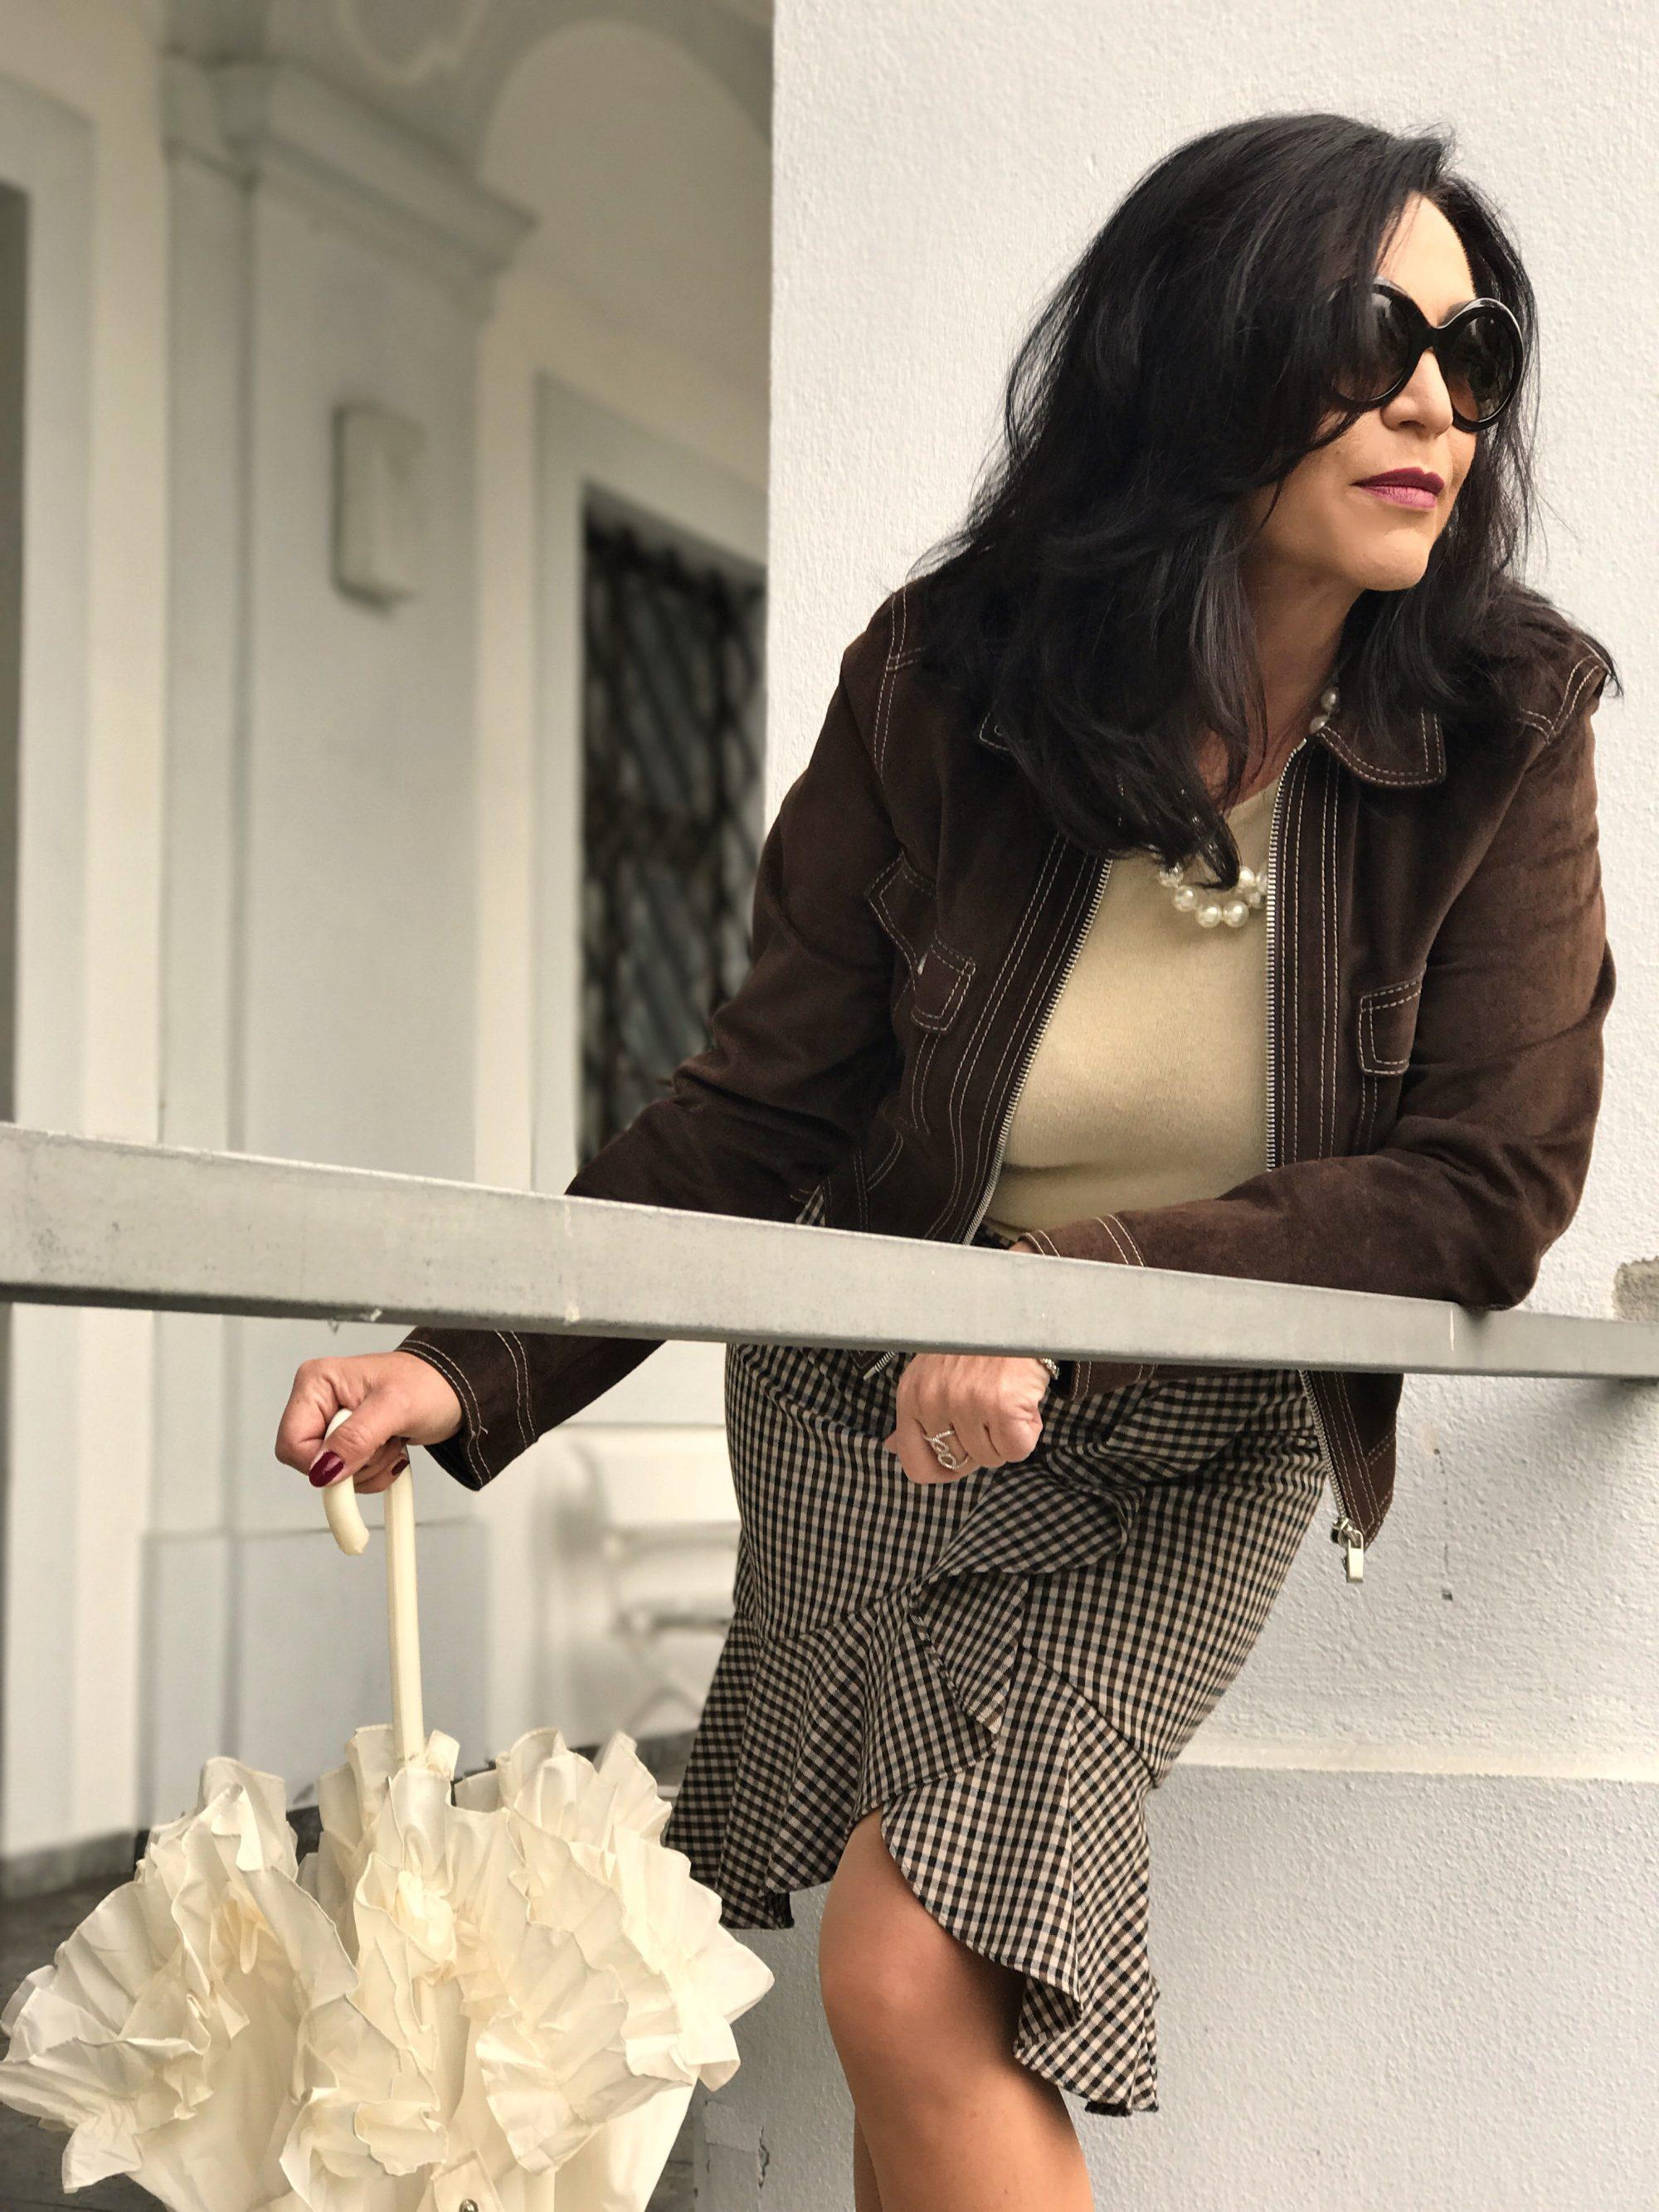 Boss woman, Dolce and Gabbana, Streetstyle, Louboutin, Louboutin in public, cashmere, ageless style, ageless fashion, Fashionblog Augsburg, influencer, bestage, eyewear